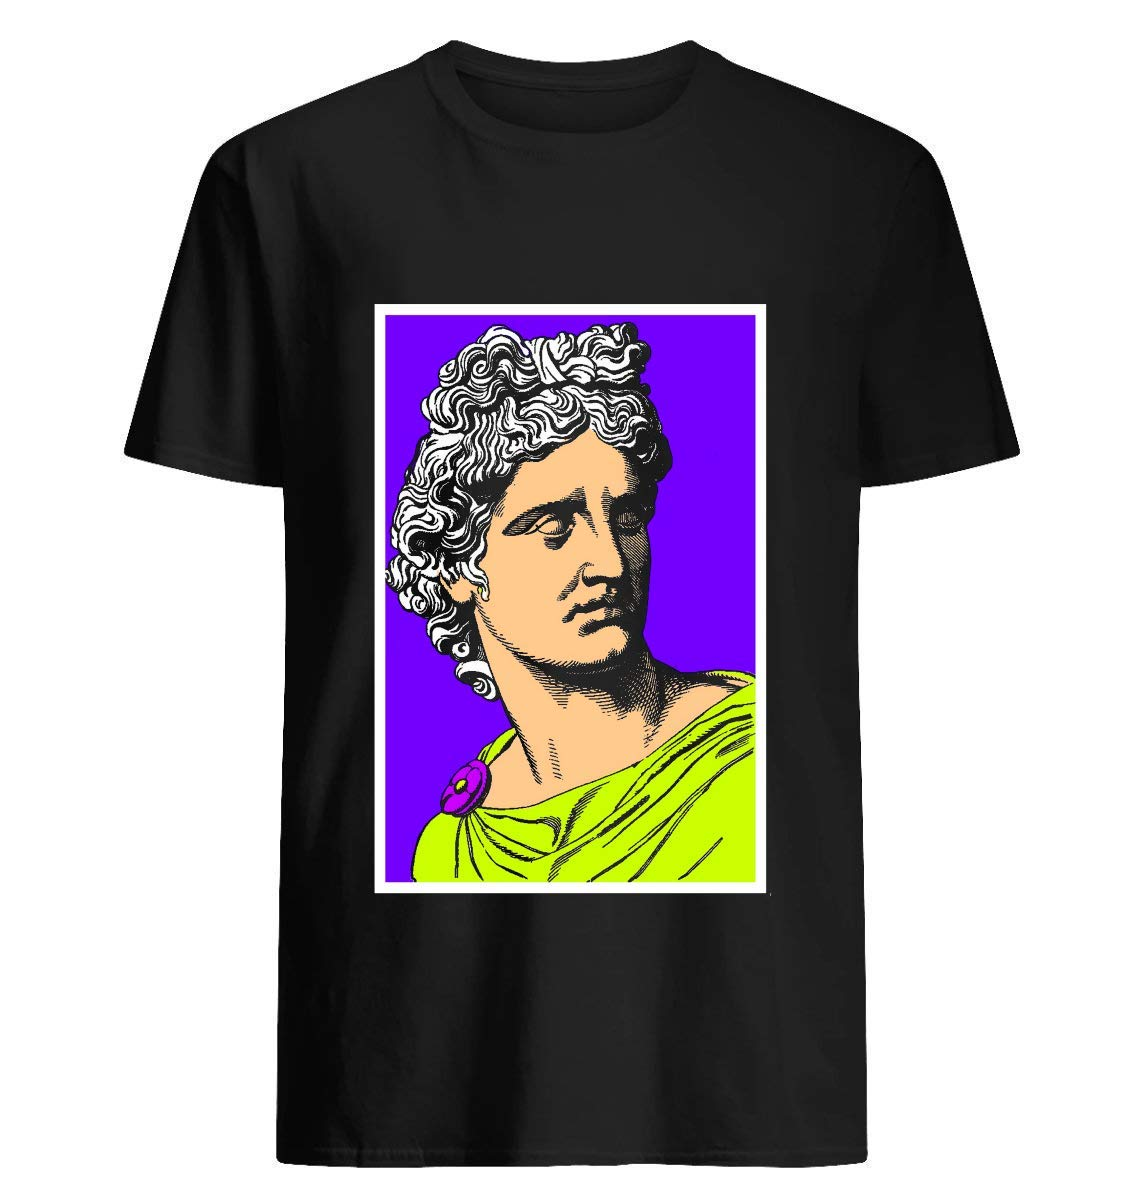 Apollo T Shirt 76 T Shirt For Unisex